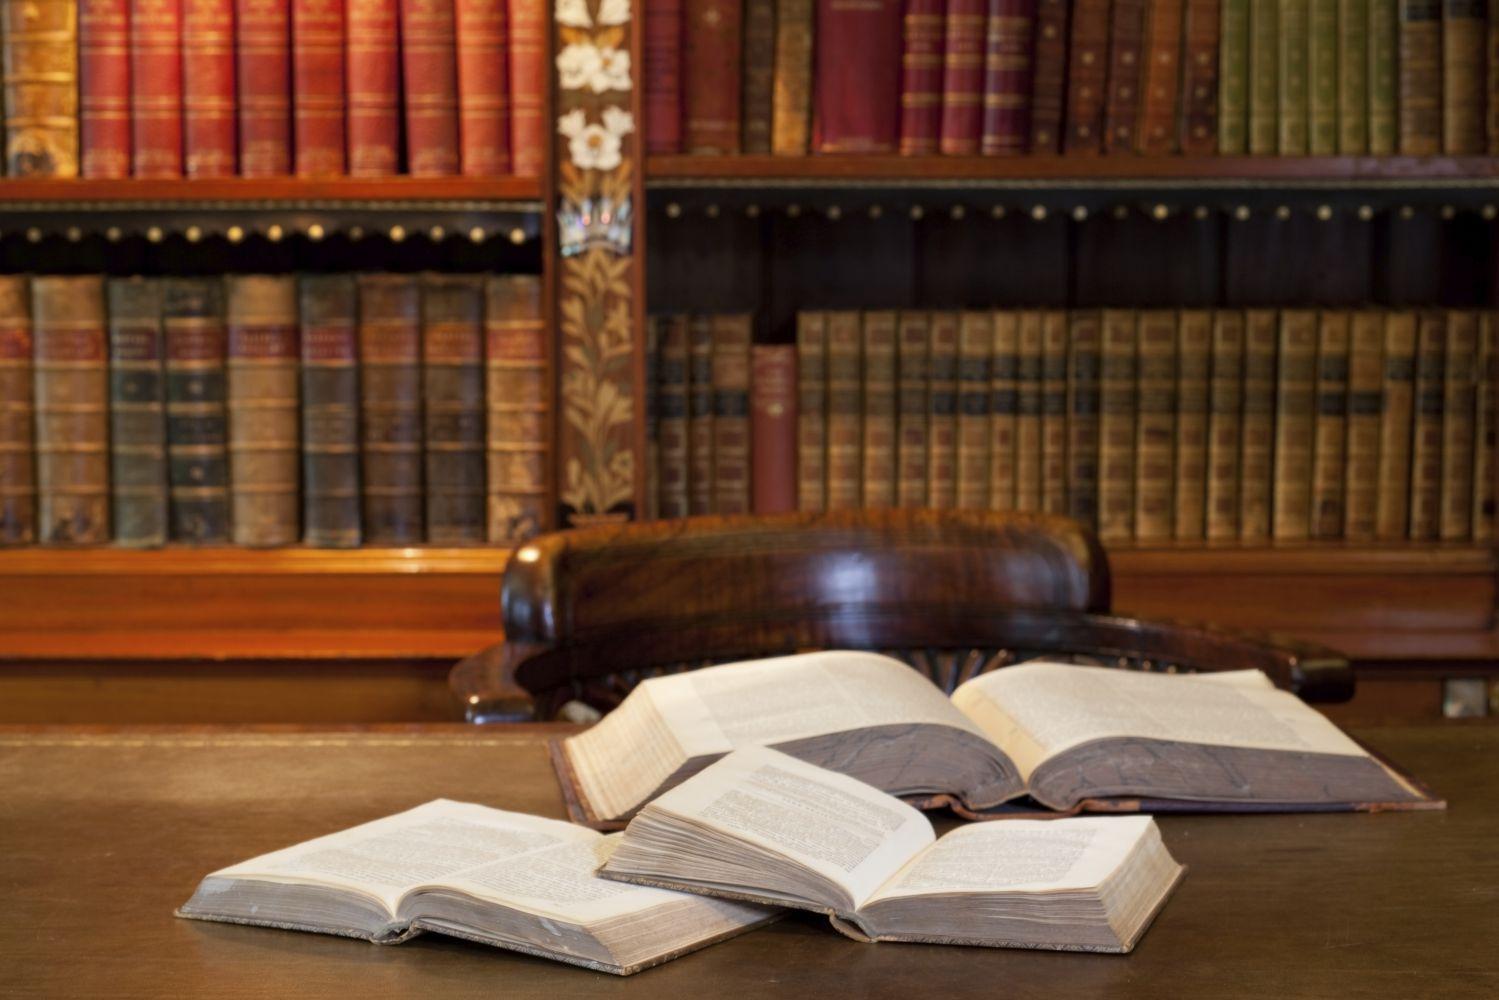 Book in a law office in Richmond Hill, GA